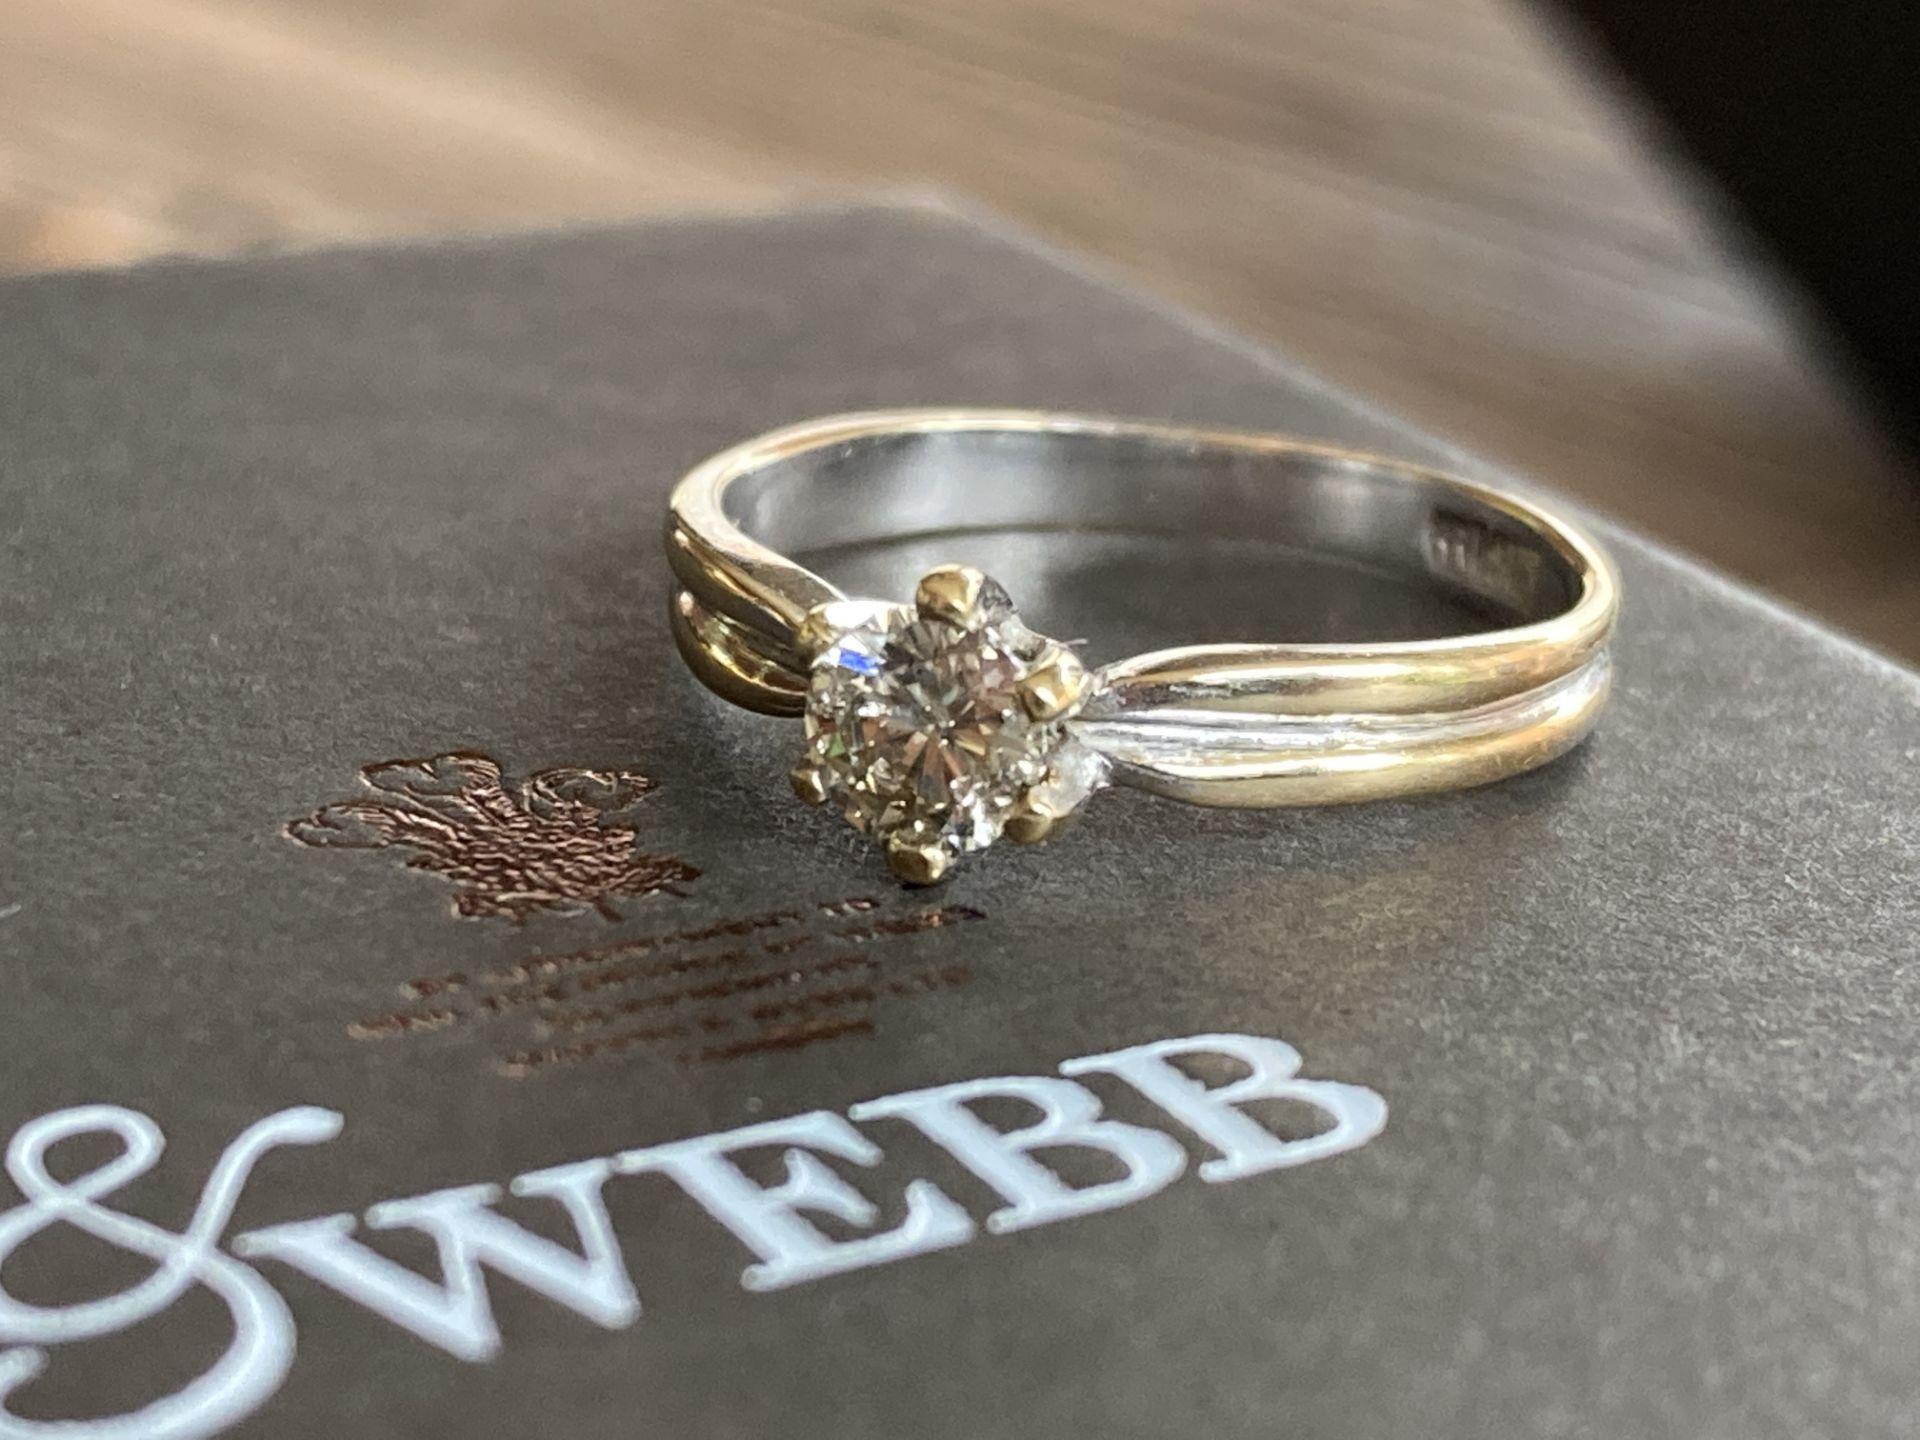 0.35CT DIAMOND SET RING IN 18K GOLD